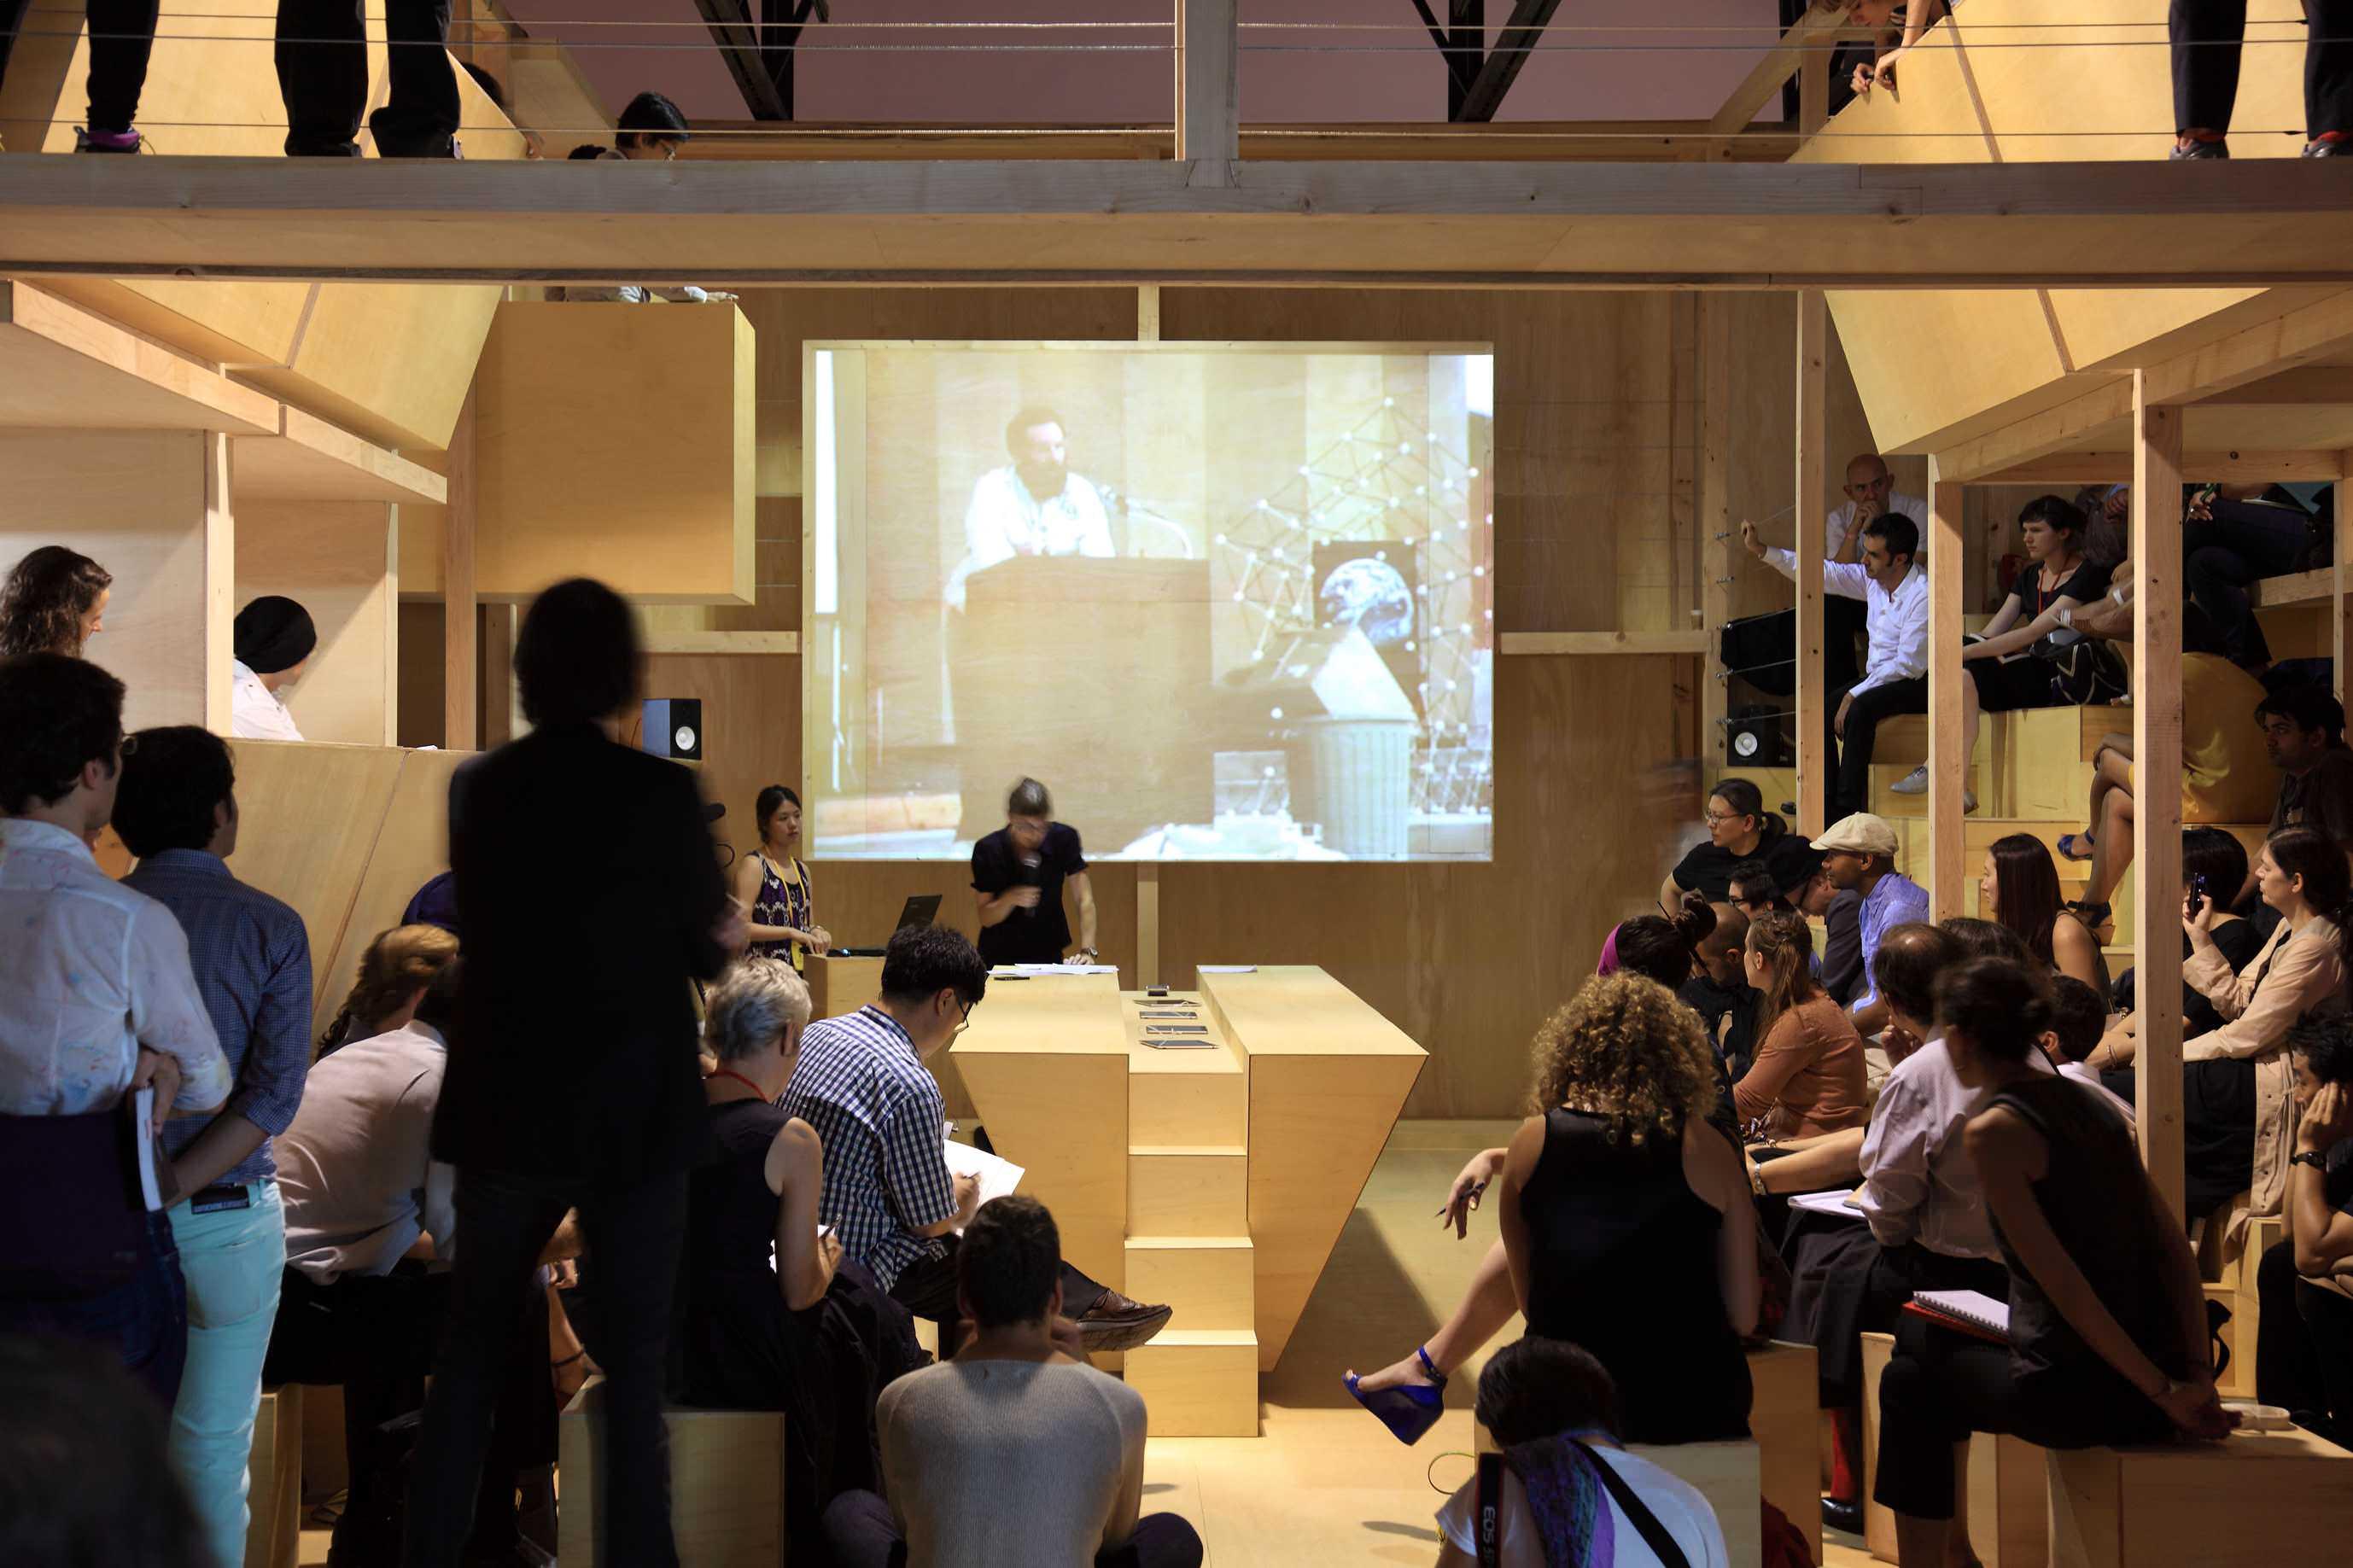 Gwangju Biennial On Site, a community Hub for content production, 2011. A project by nOffice (Miessen Pflugfelder Nilsson). Photography by JomgOh Kim.